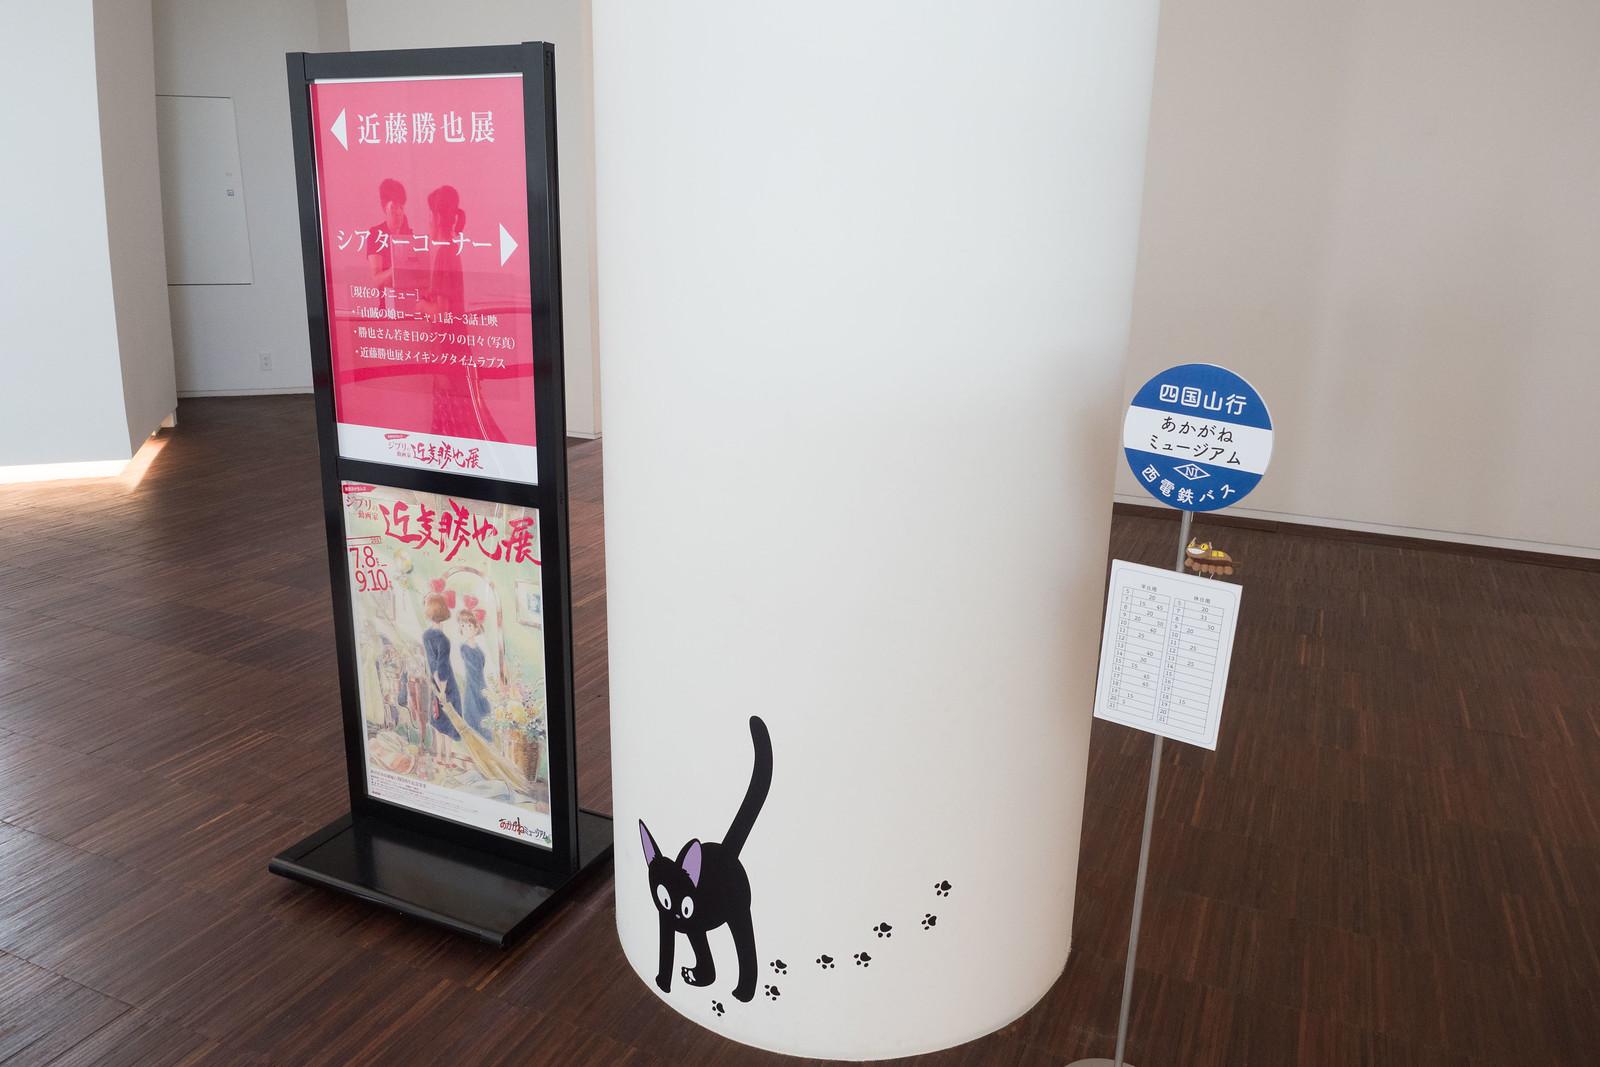 Ghibli_katsuyakondo-14